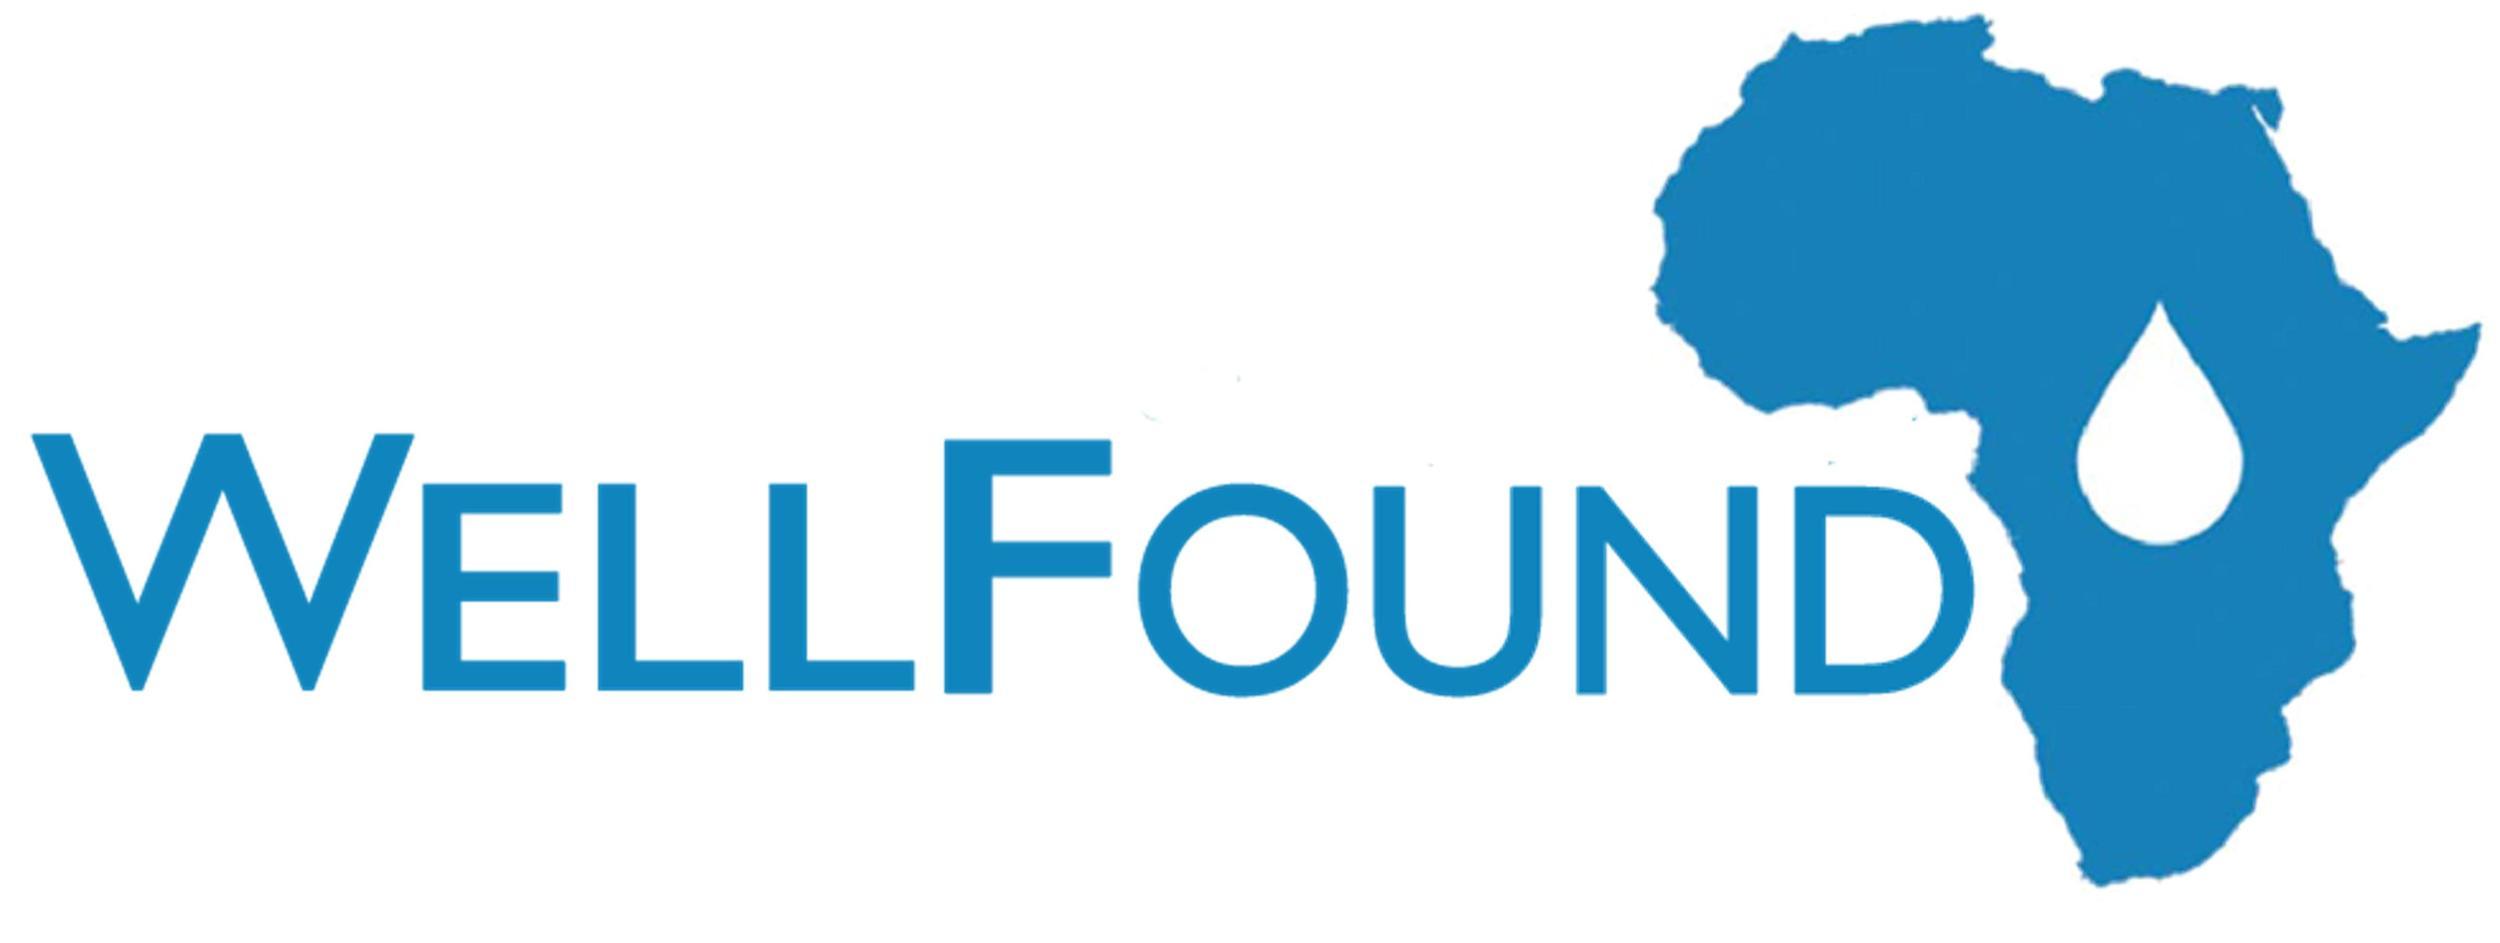 Operation WellFound